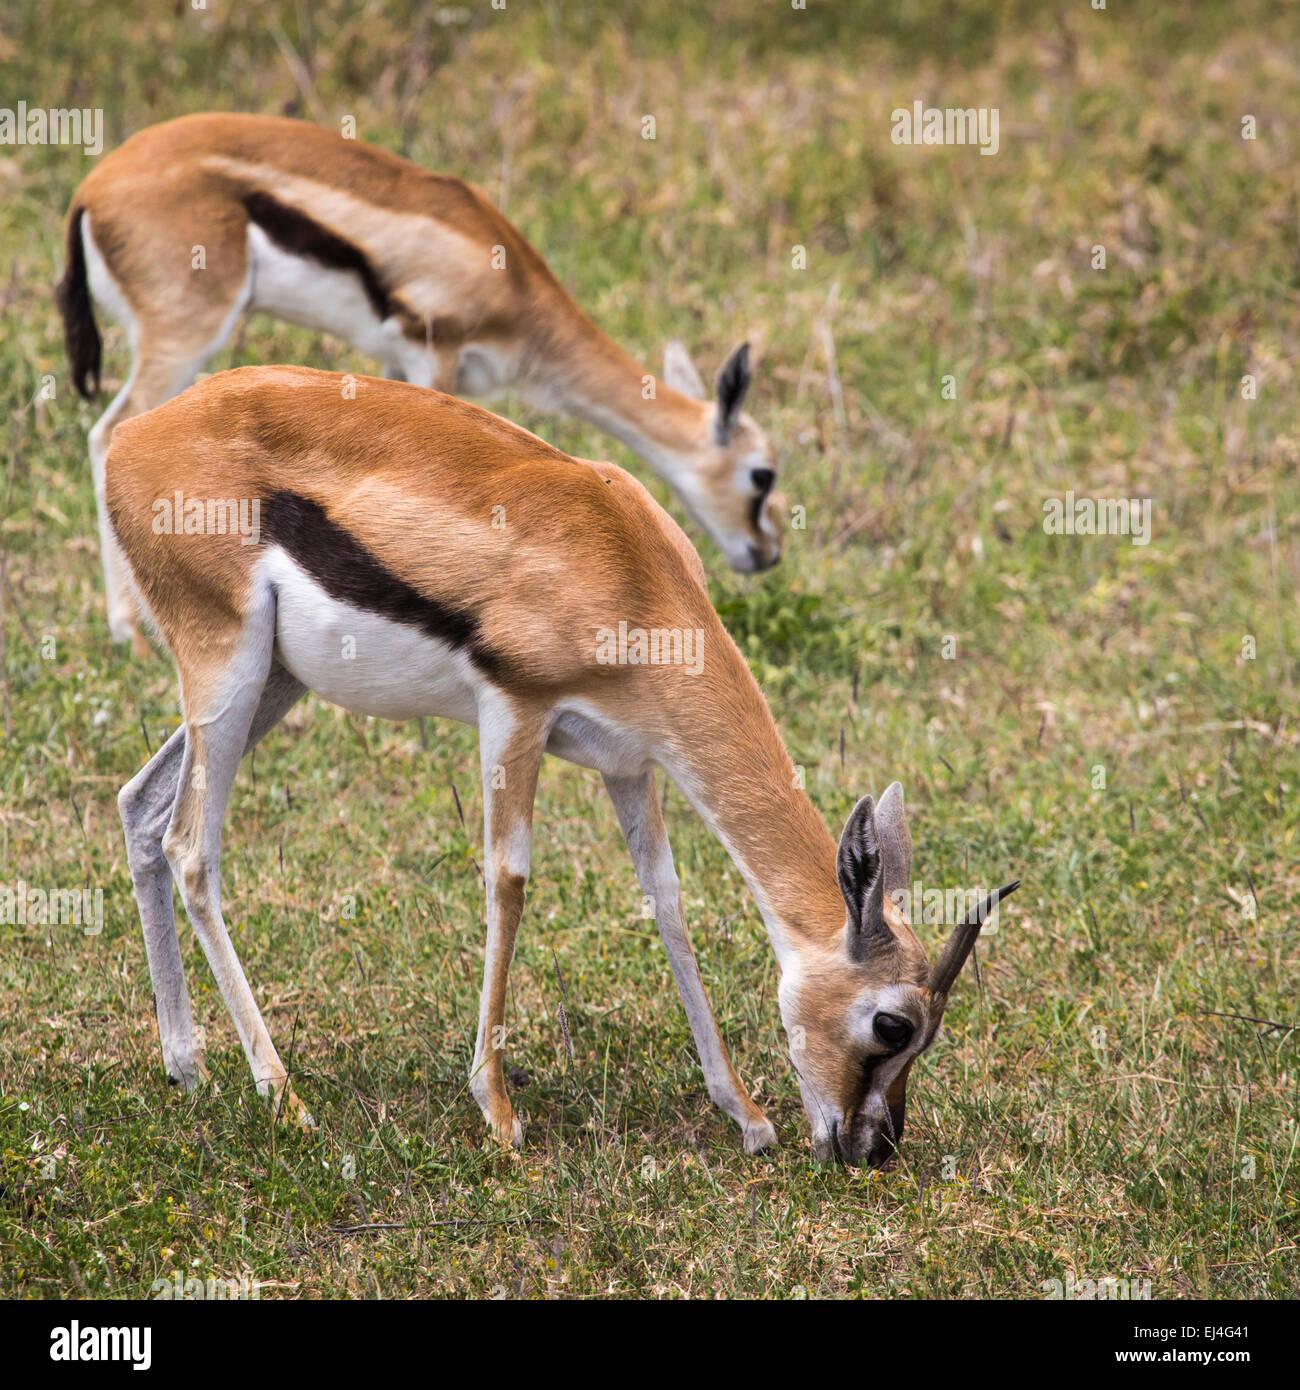 Female impala antelopes in Maasai Mara National Reserve, Kenya. - Stock Image